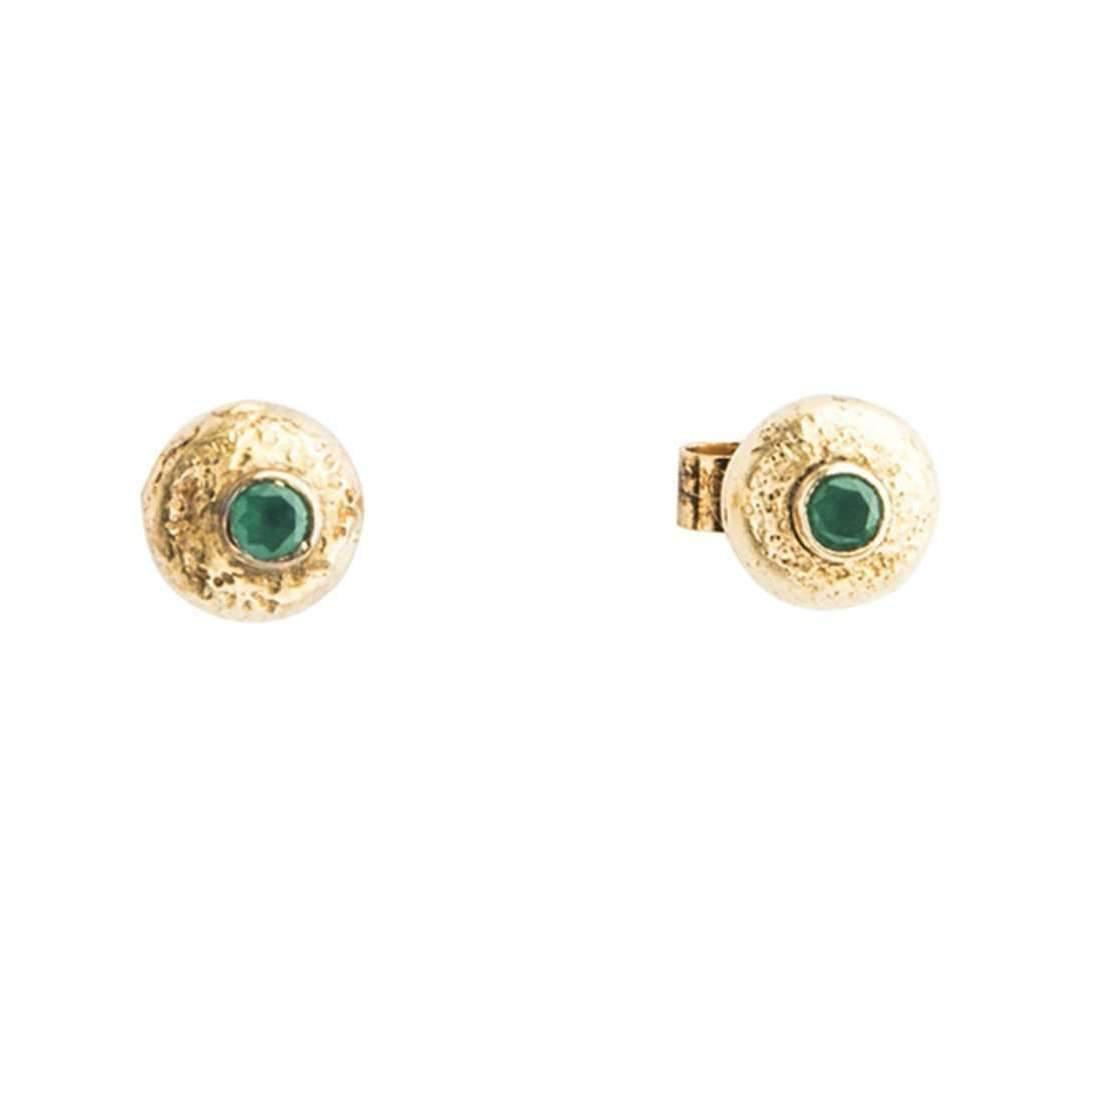 Becky Dockree Small Gold Stud Earrings K8LiS5X